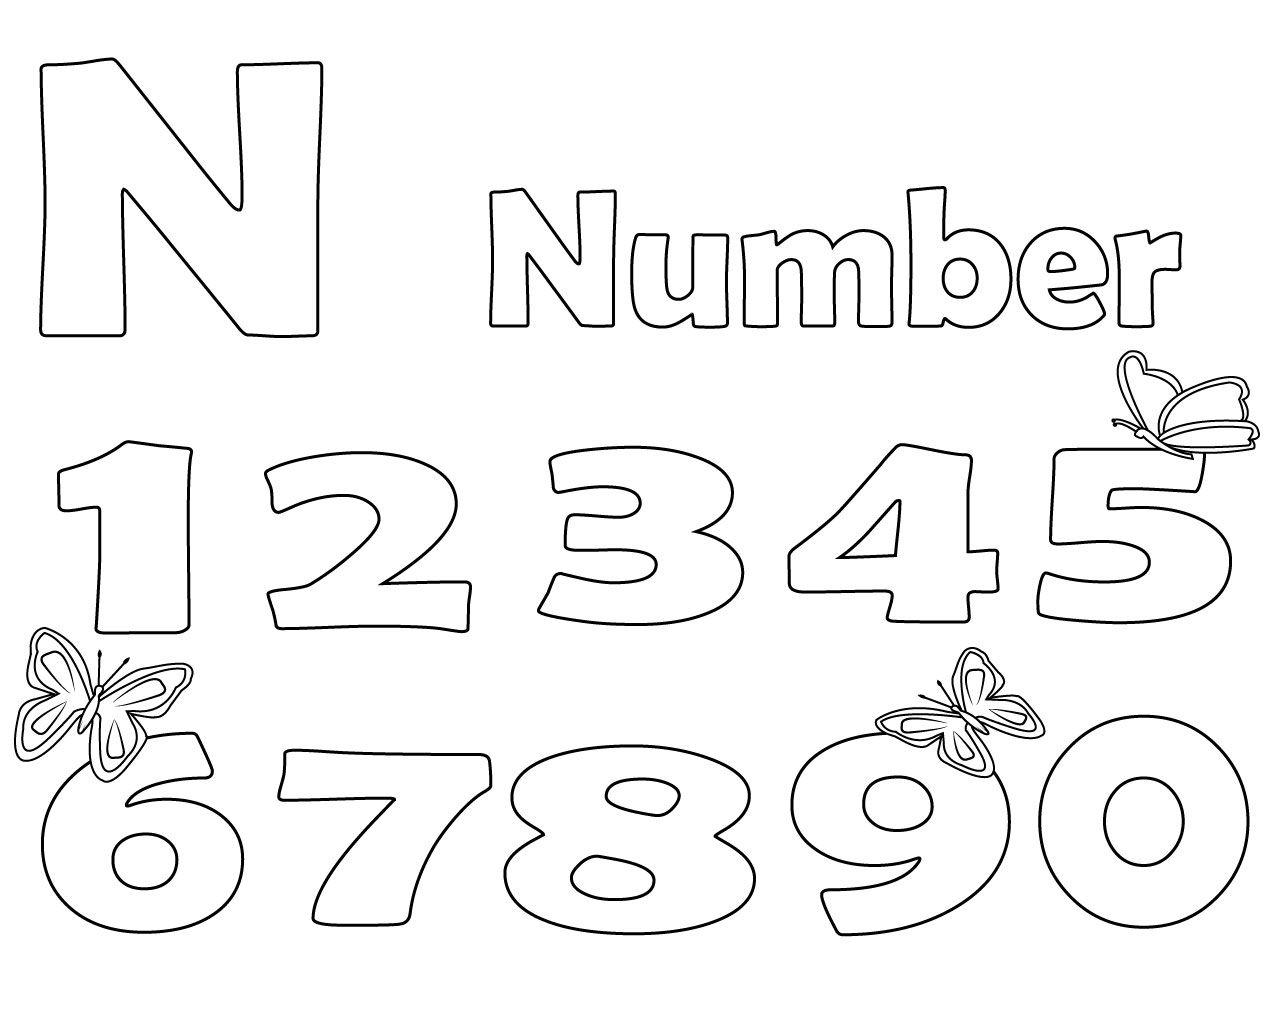 Letter N Coloring Pages Preschool Alphabet Letter Activities Letter N Printable Letters